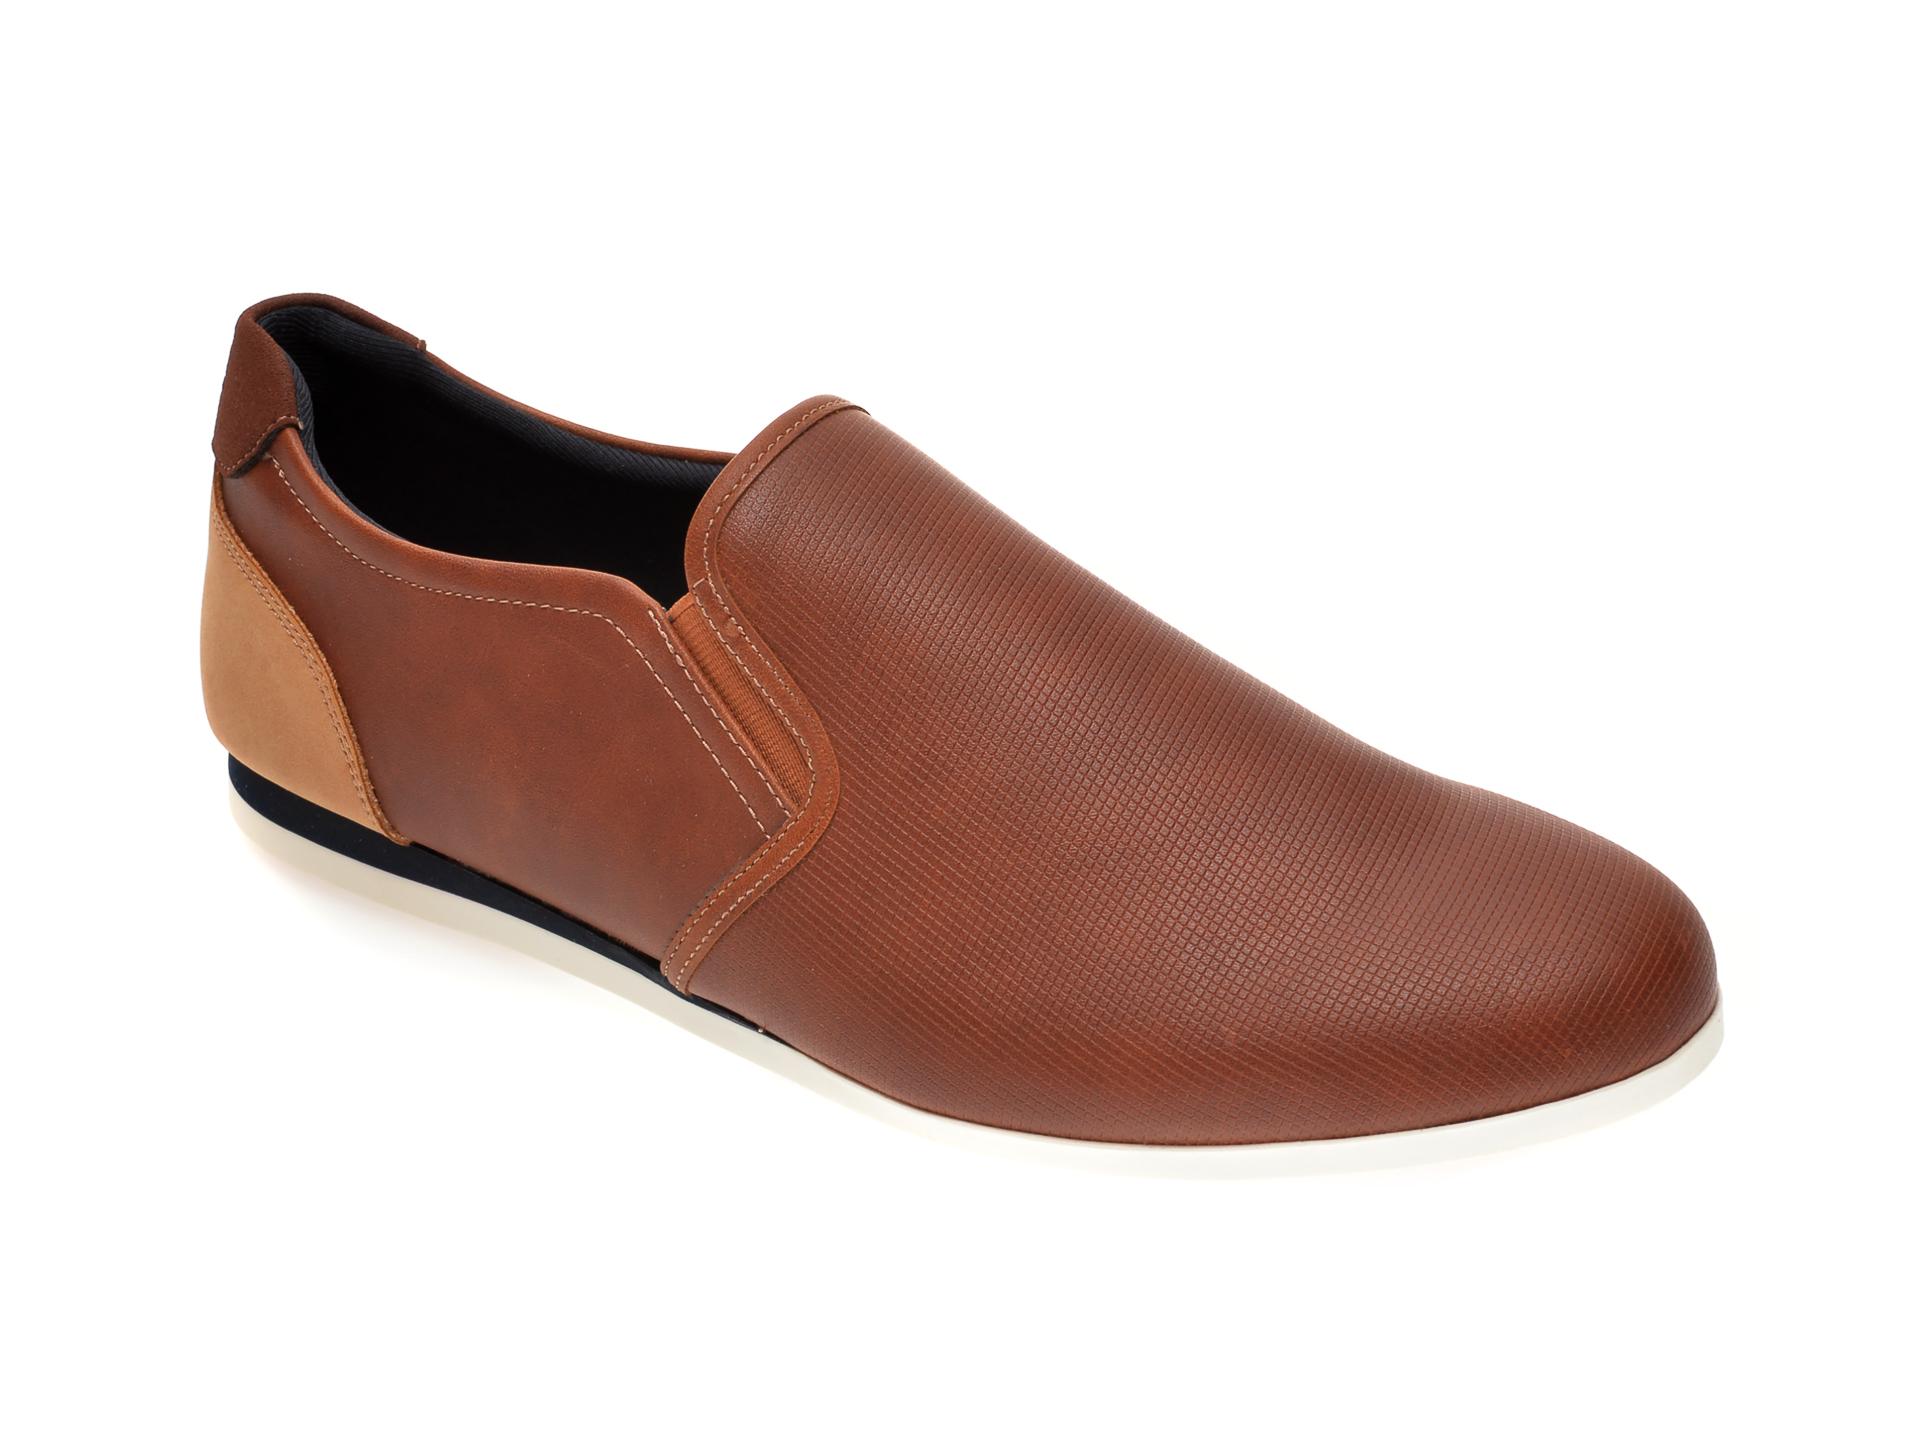 Pantofi Aldo Maro, Keliniel230, Din Piele Ecologica